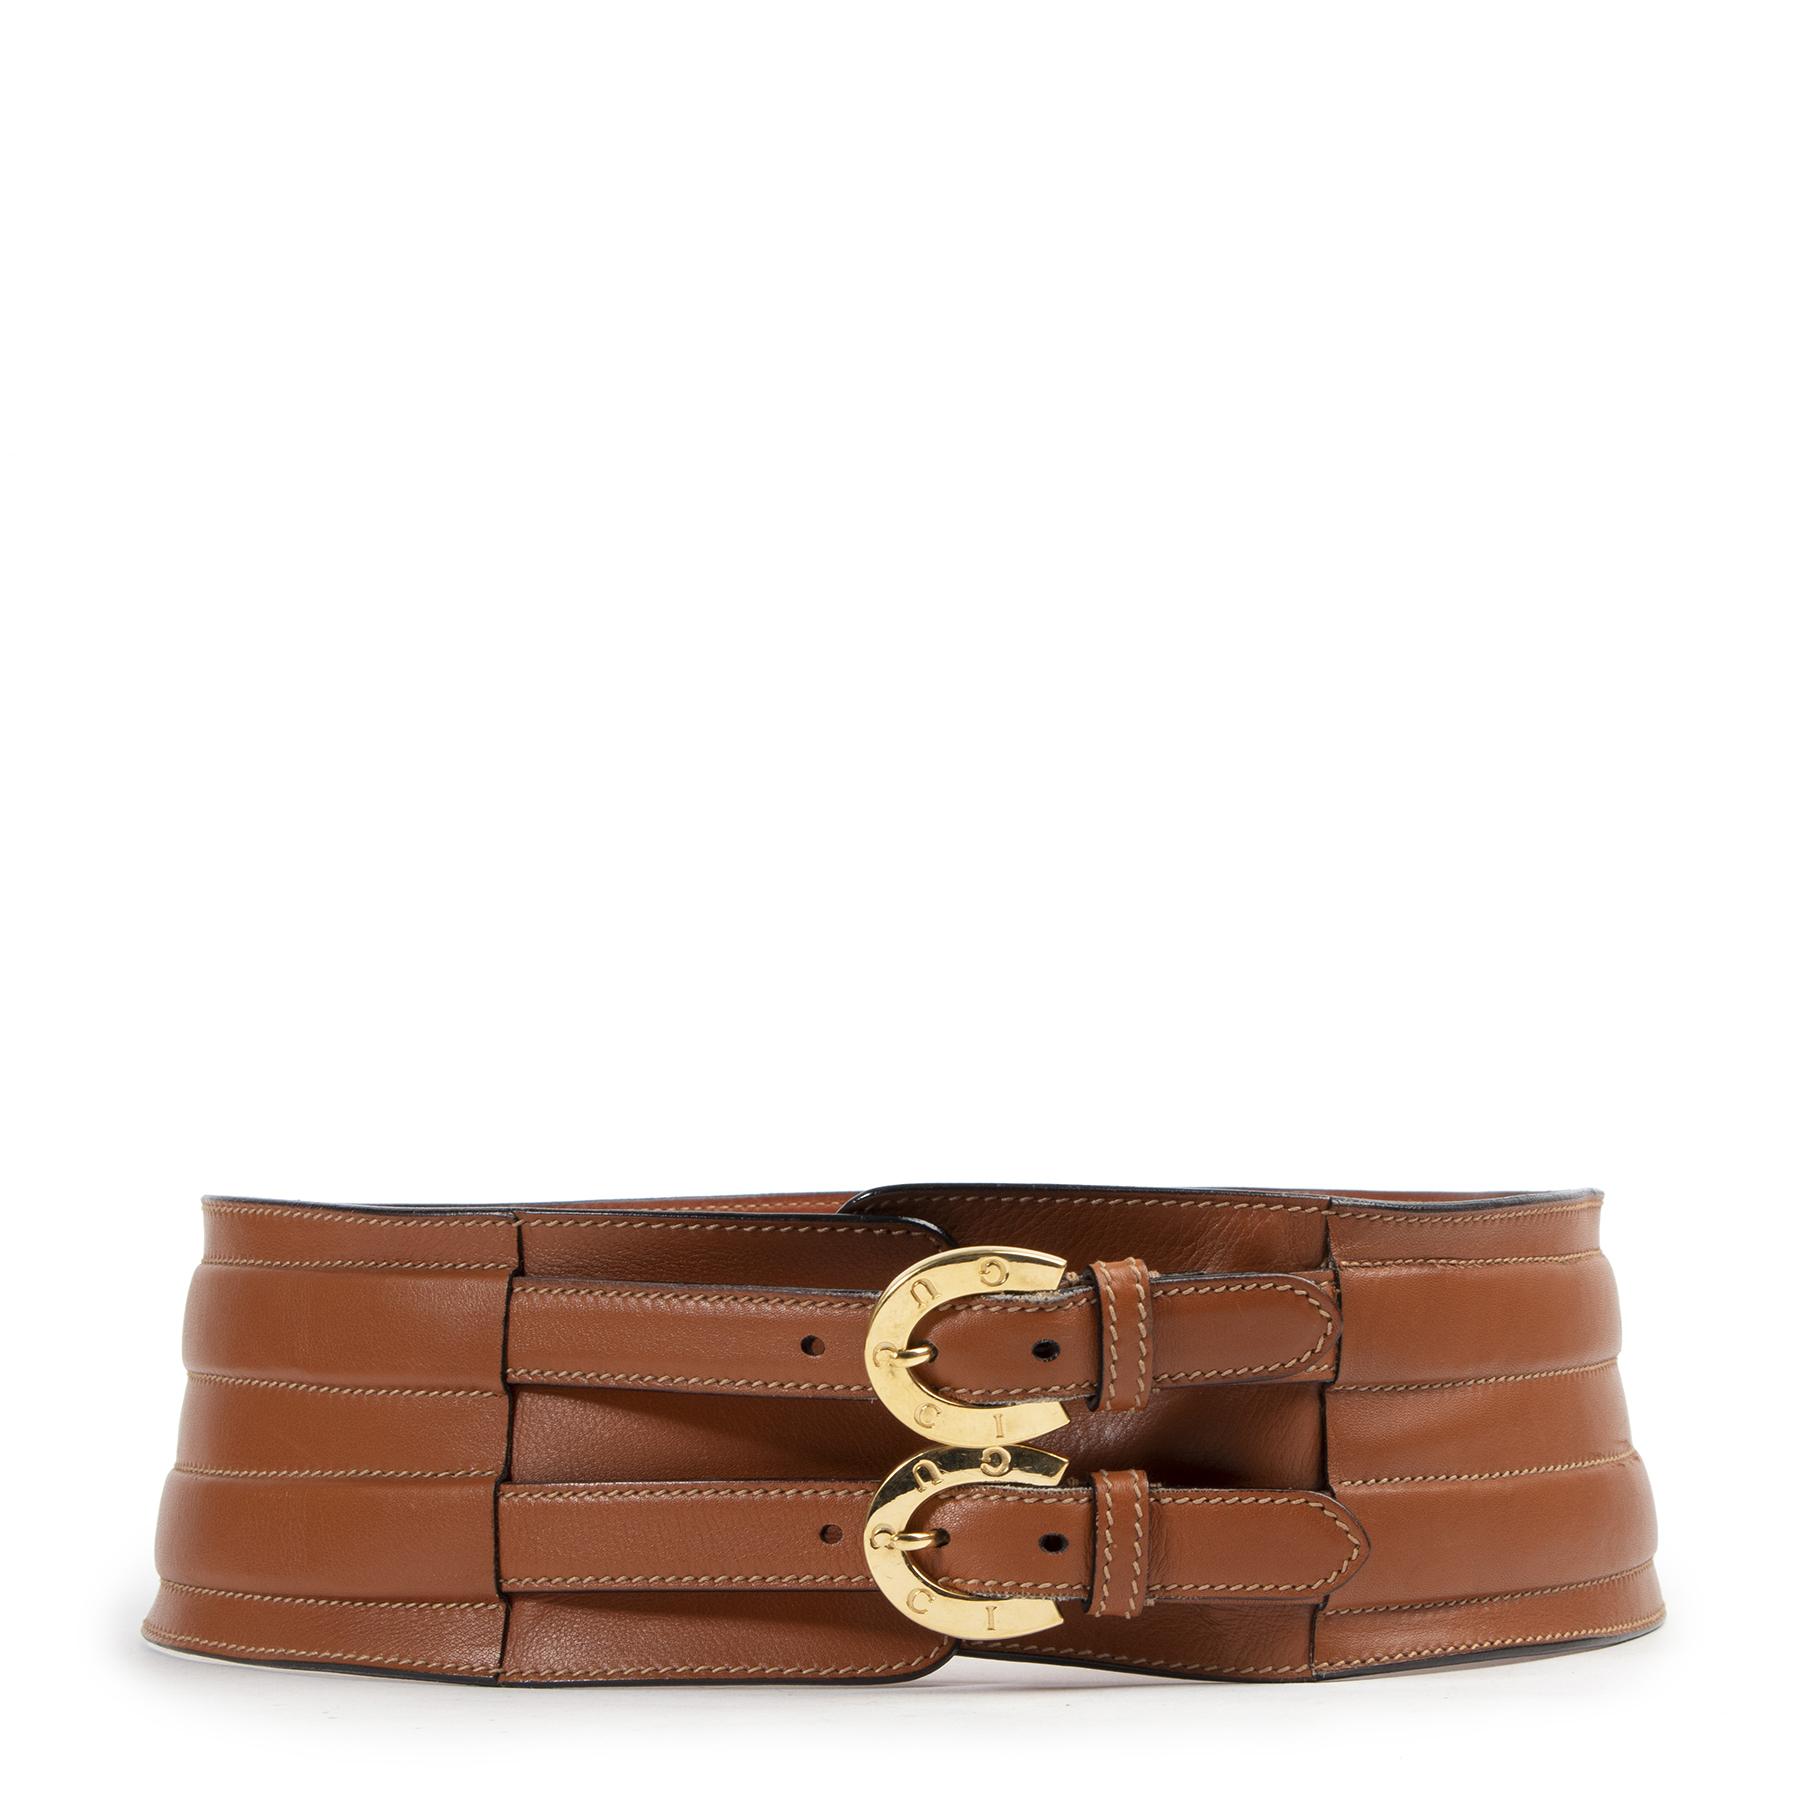 Authentic secondhand Gucci Cognac Leather Wide Waist Belt - Size 90 designer belts fashion luxury vintage webshop safe secure online shopping